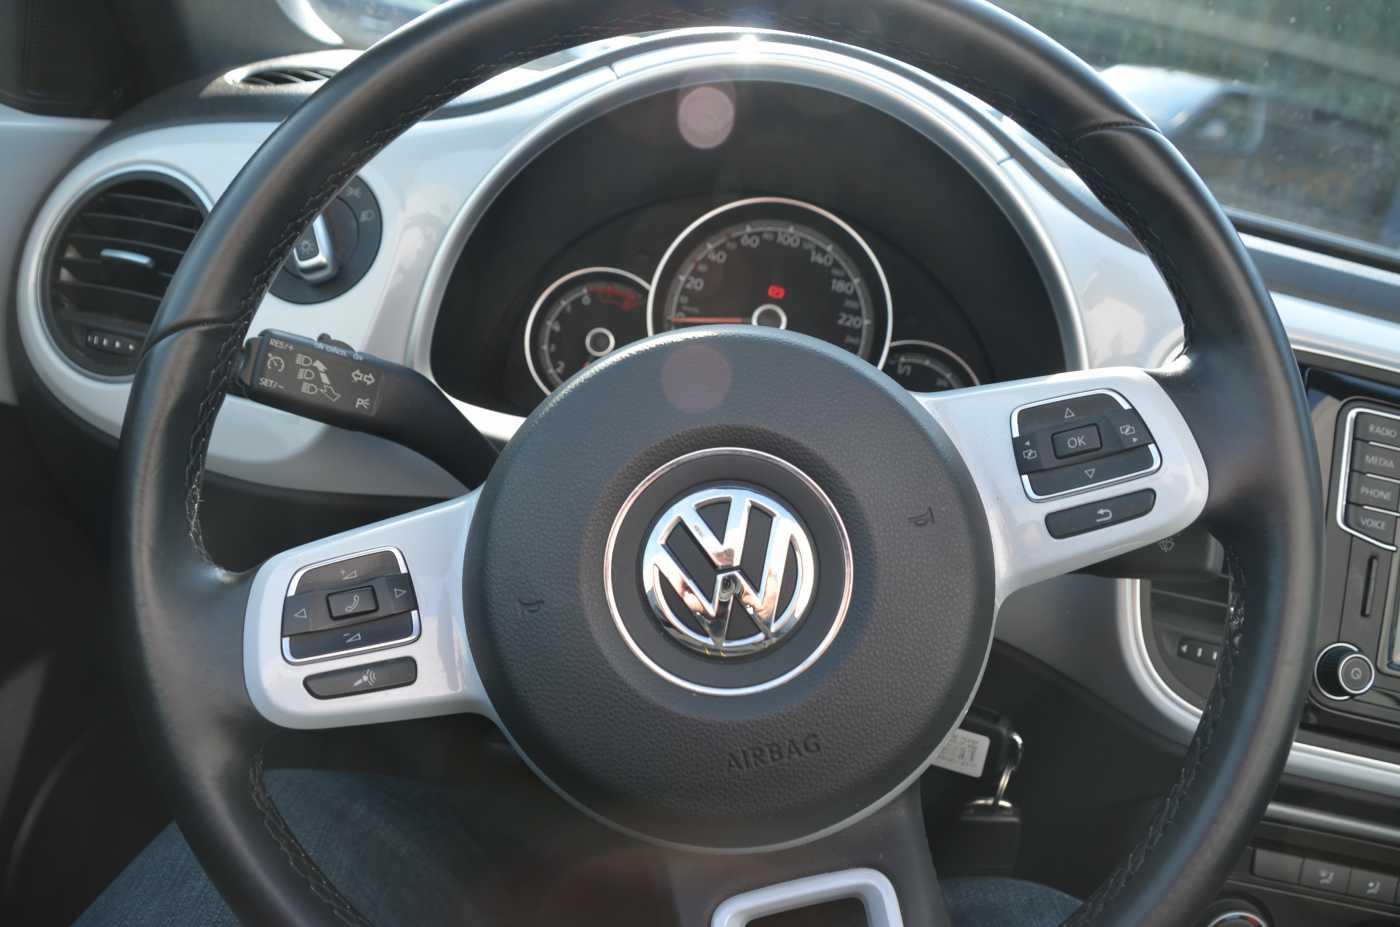 Volkswagen Beetle Mark 2 (2011) 1.2 TSI 12/12